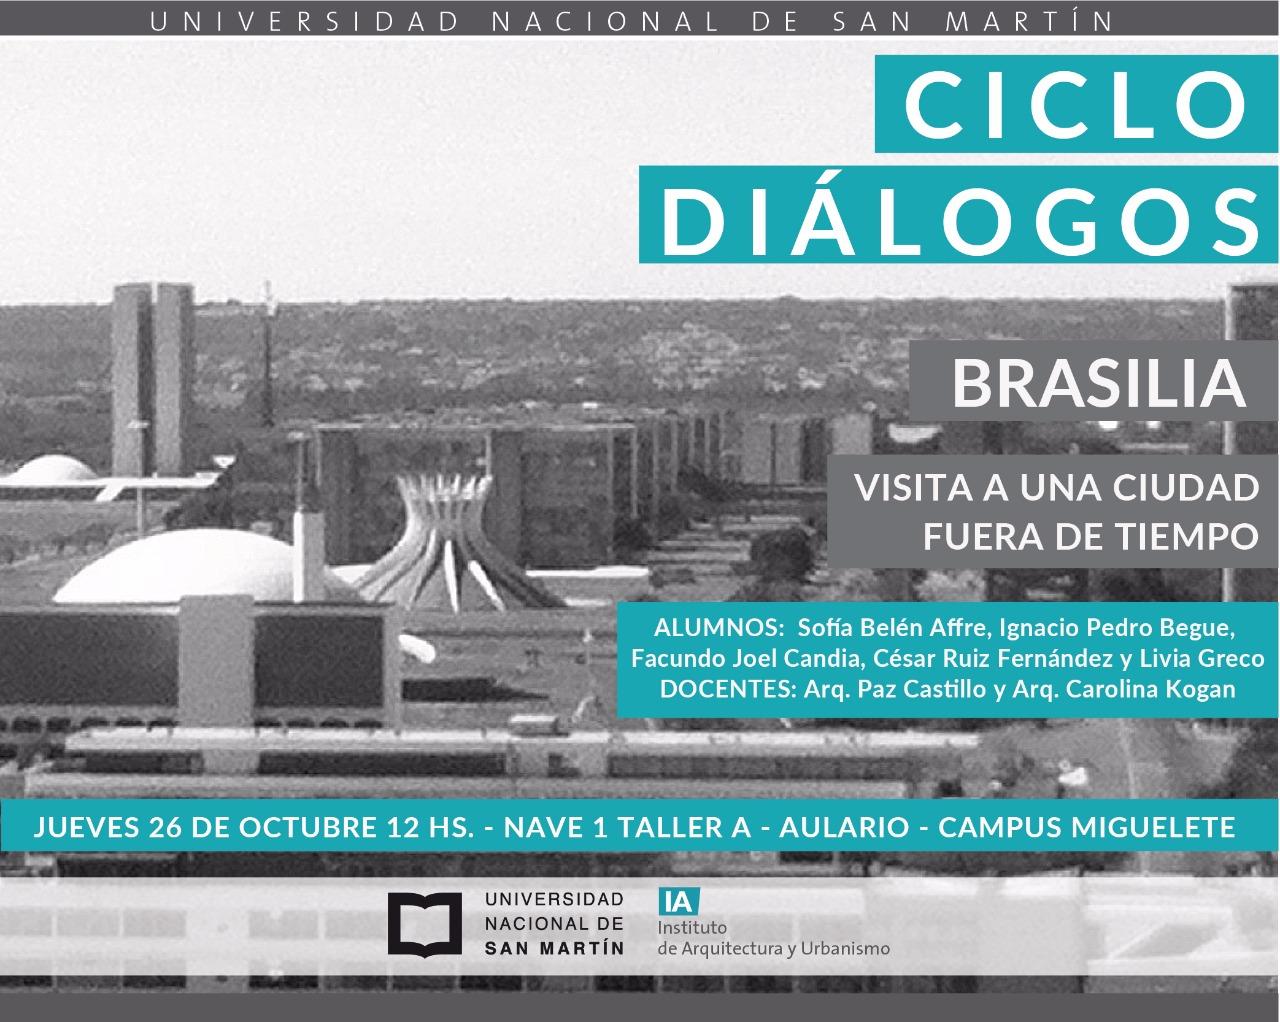 dialogos-brasilia